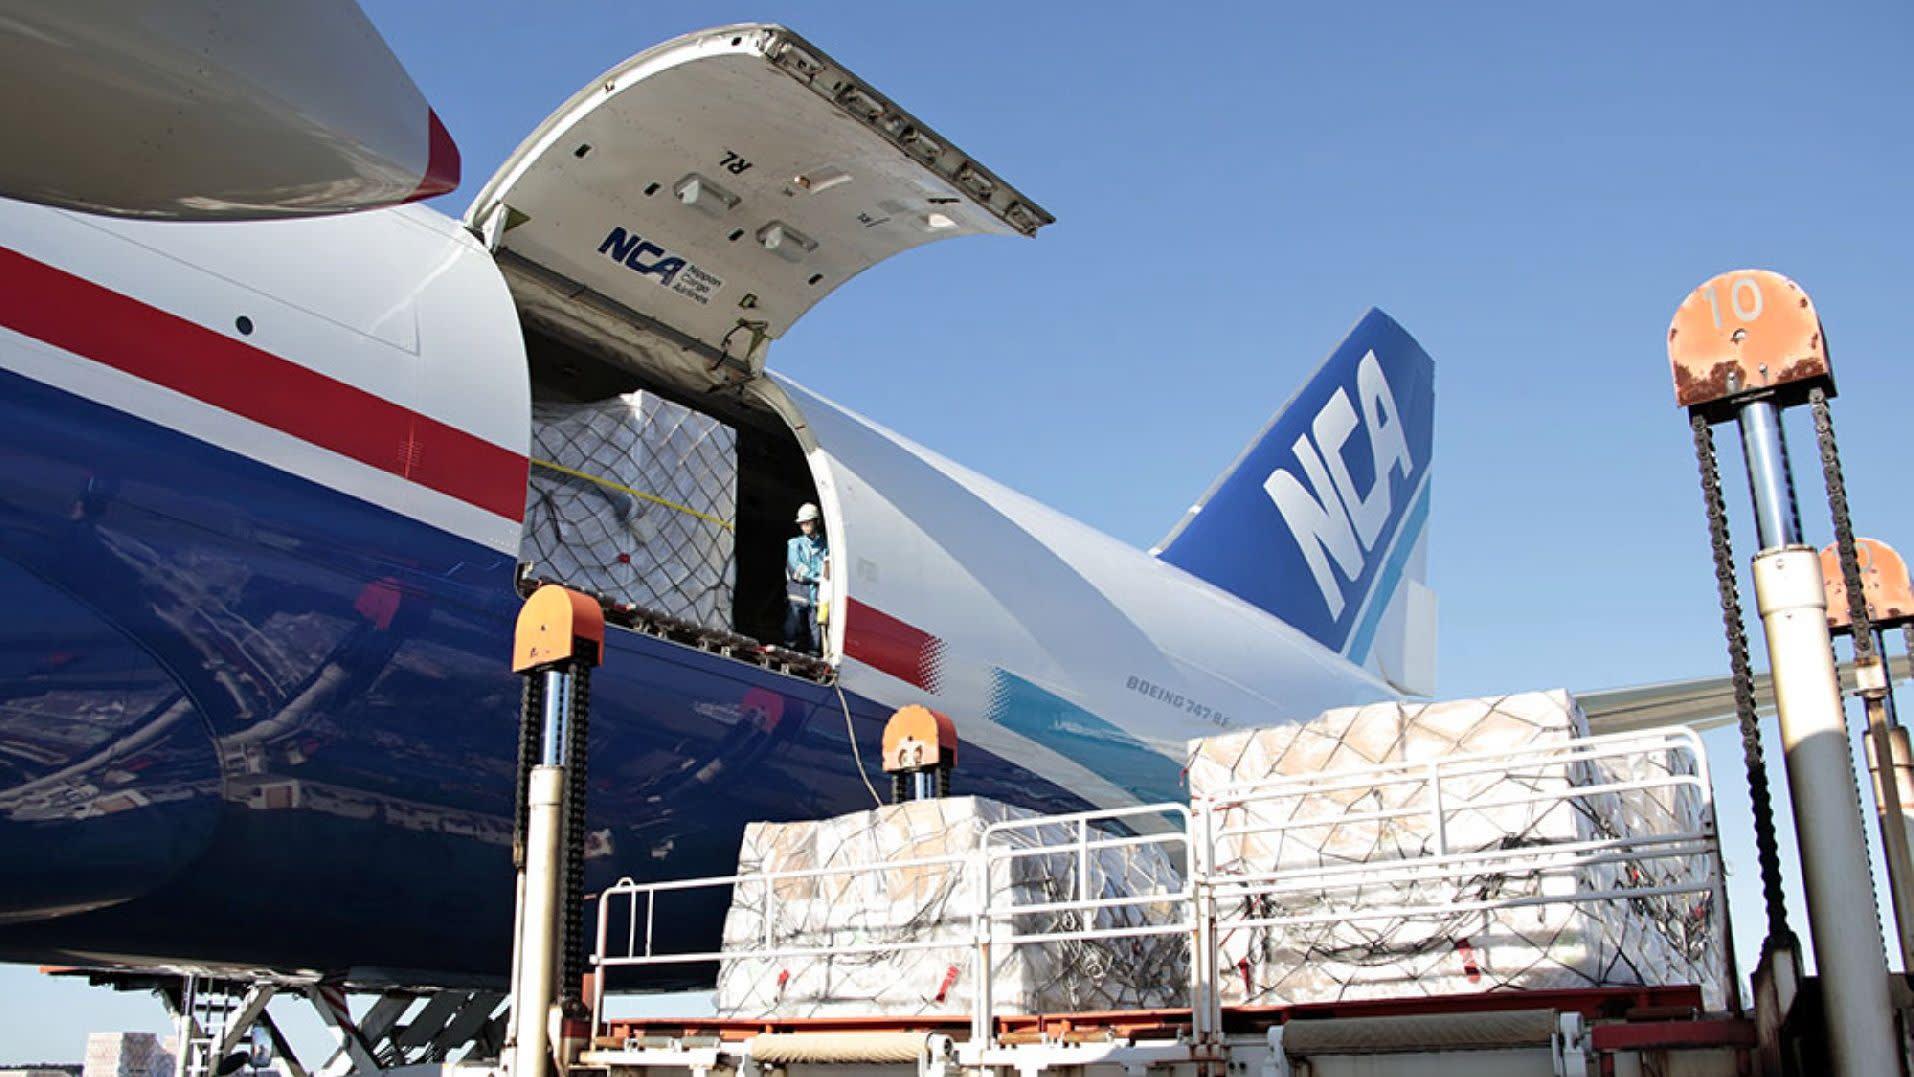 221019_Air-cargo-market